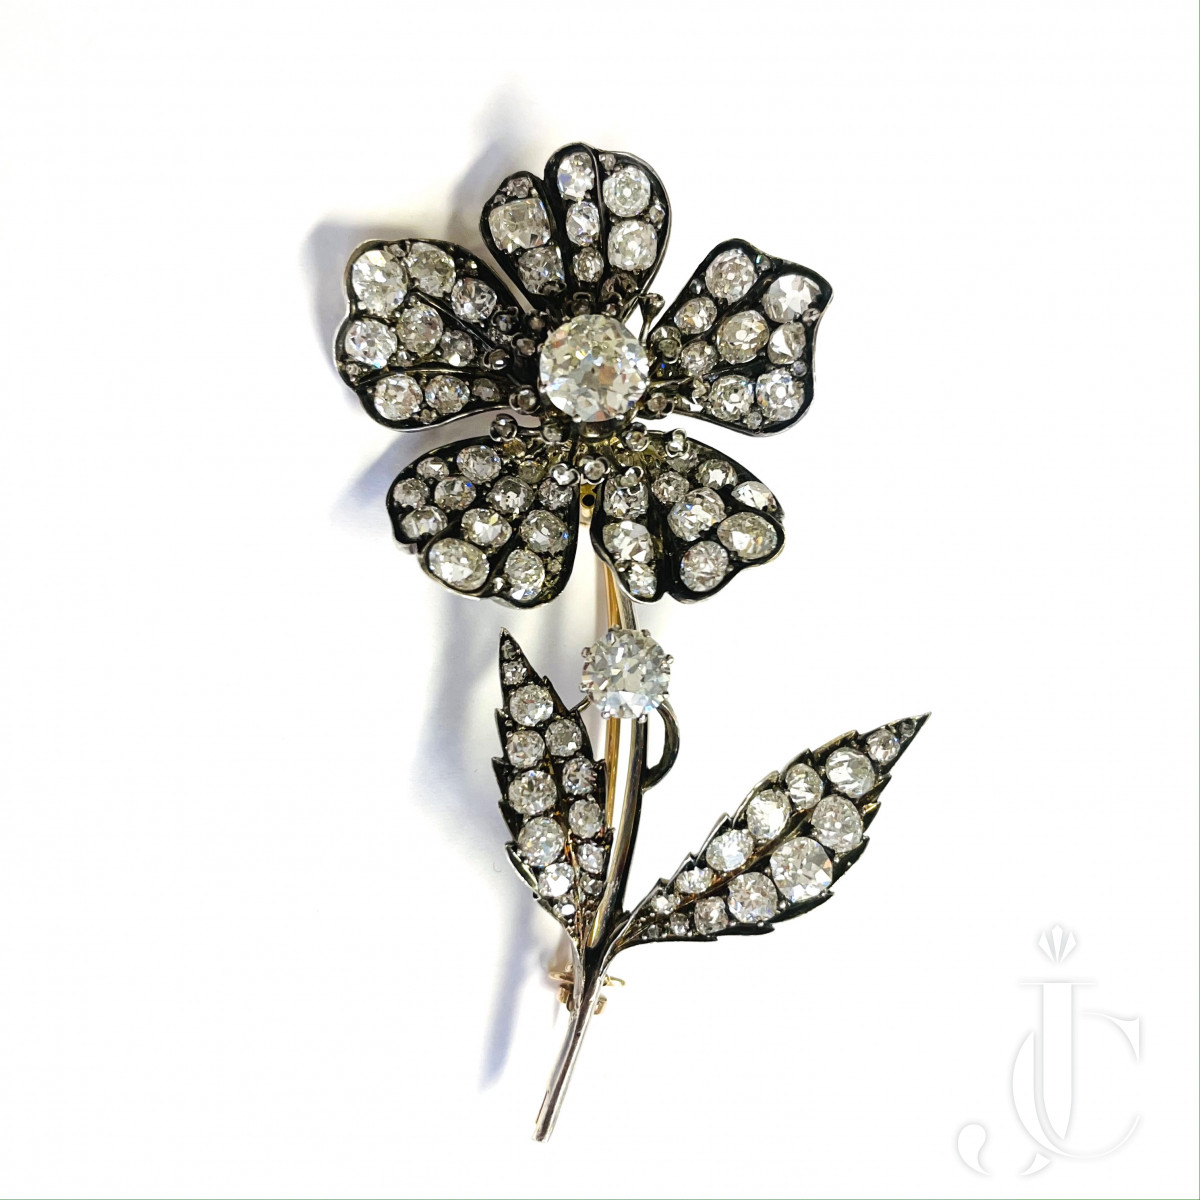 Diamond Flower Tremblent Brooch